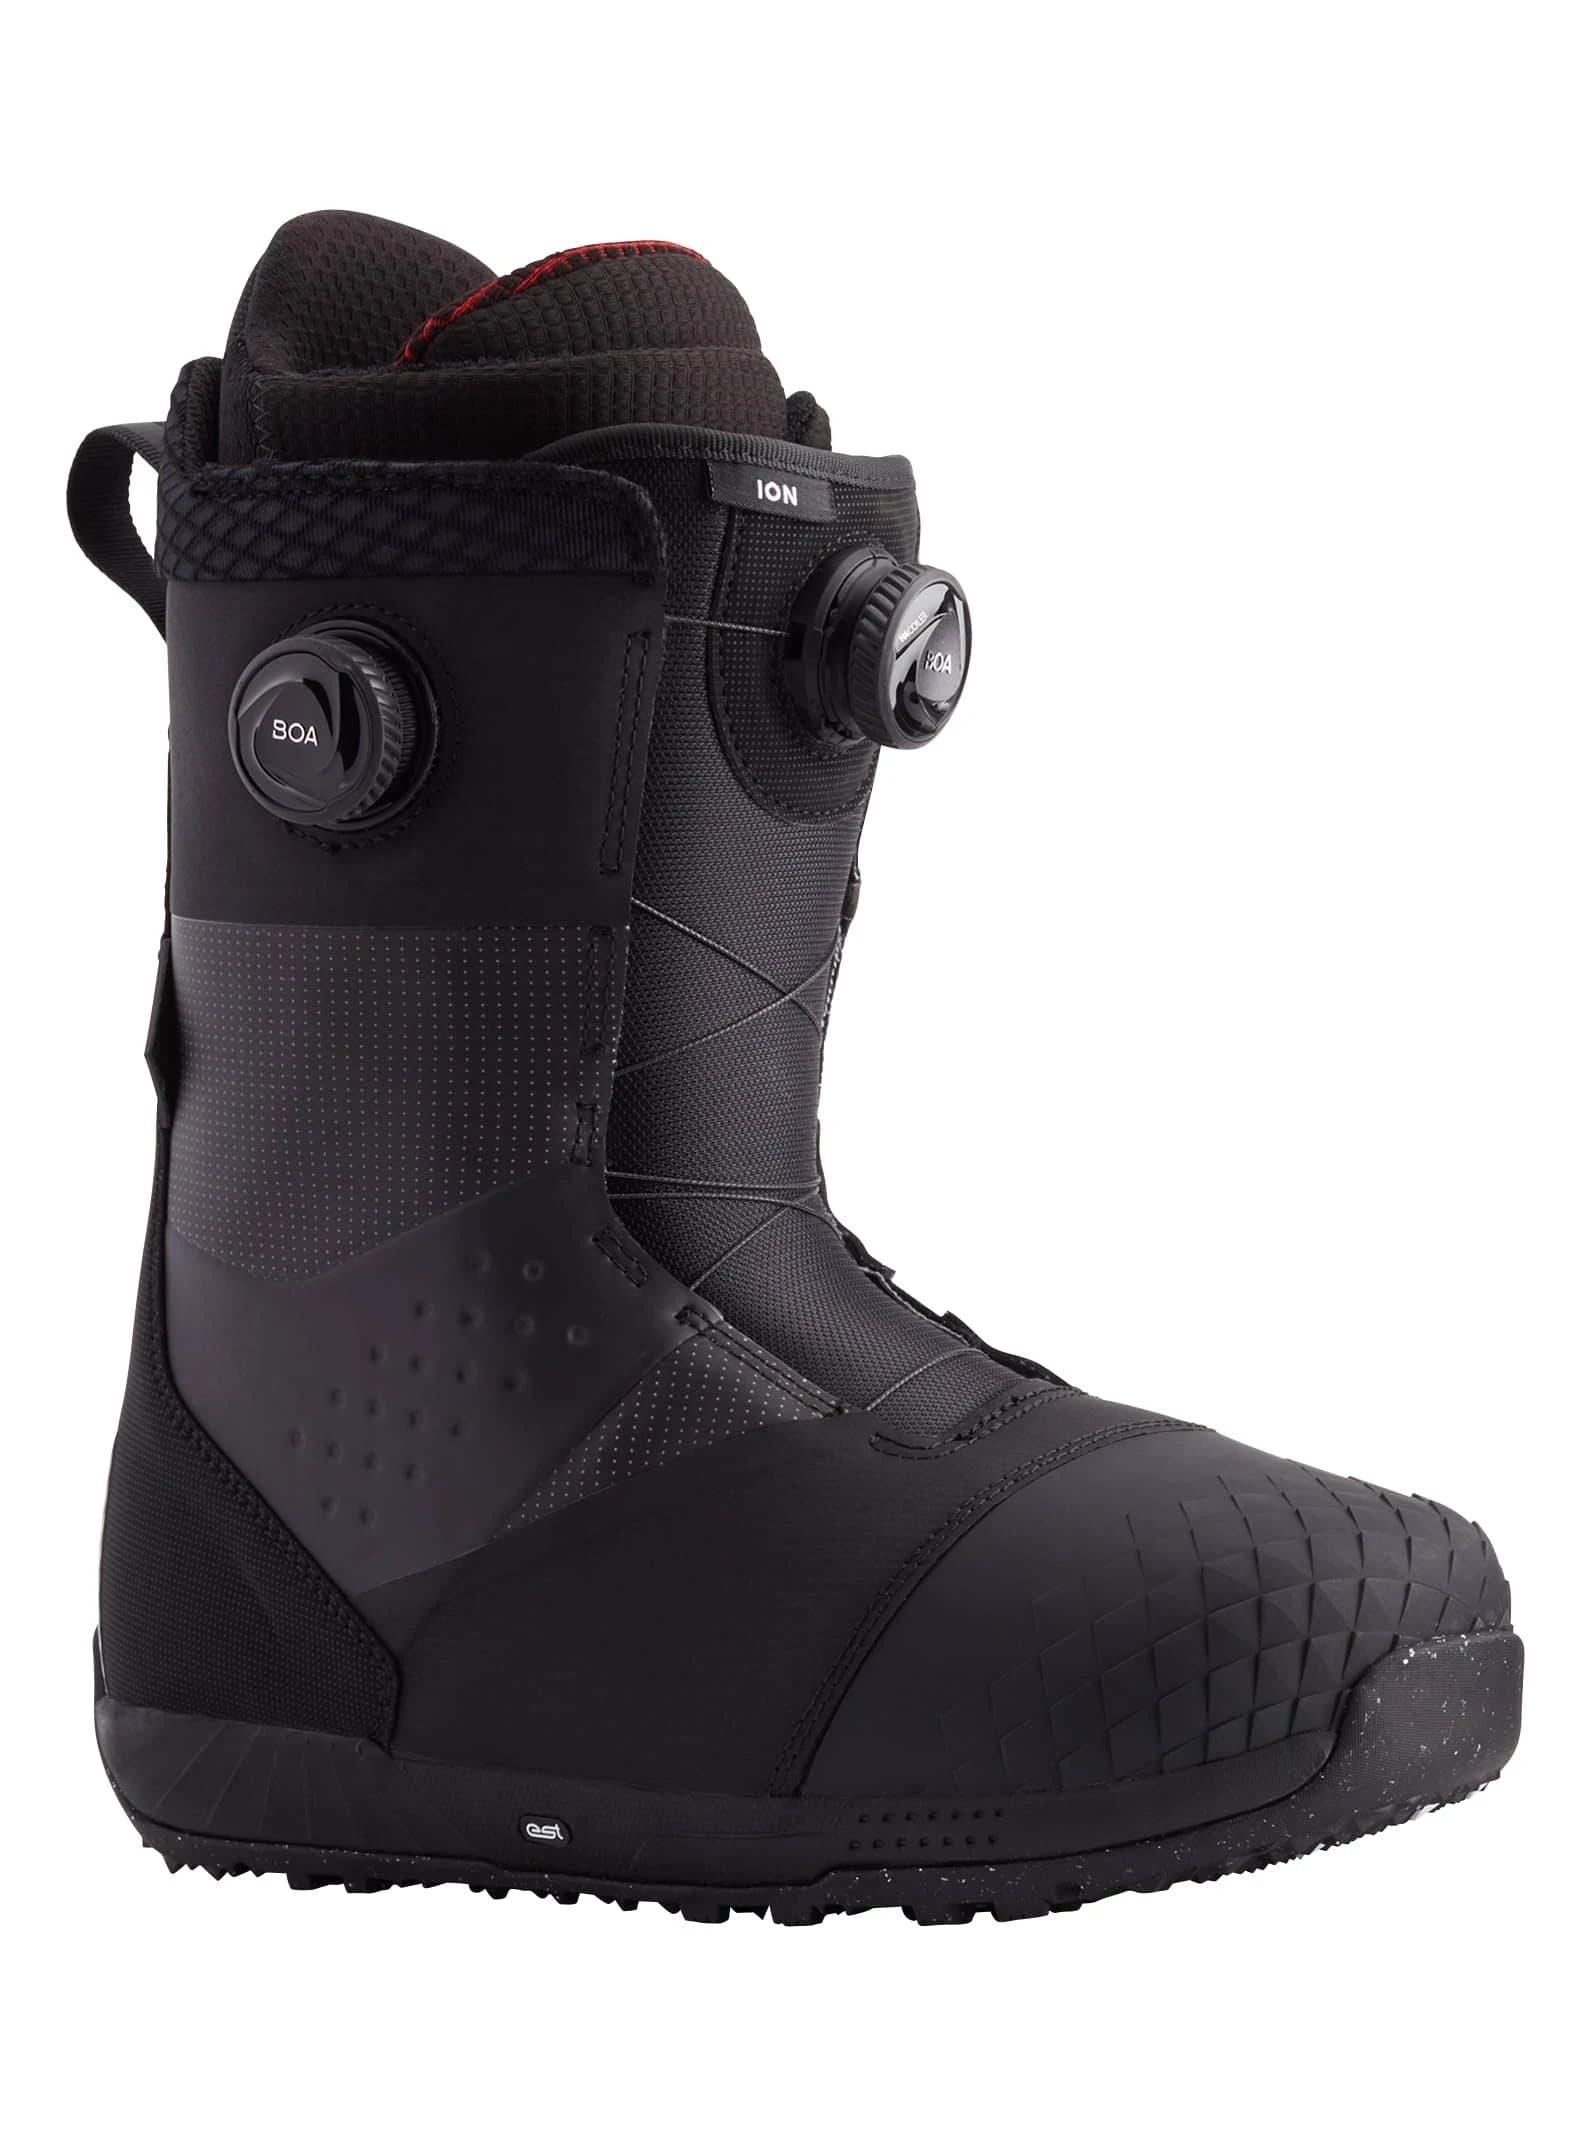 Burton Ion BOA Snowboard Boots  10.5 · 2021